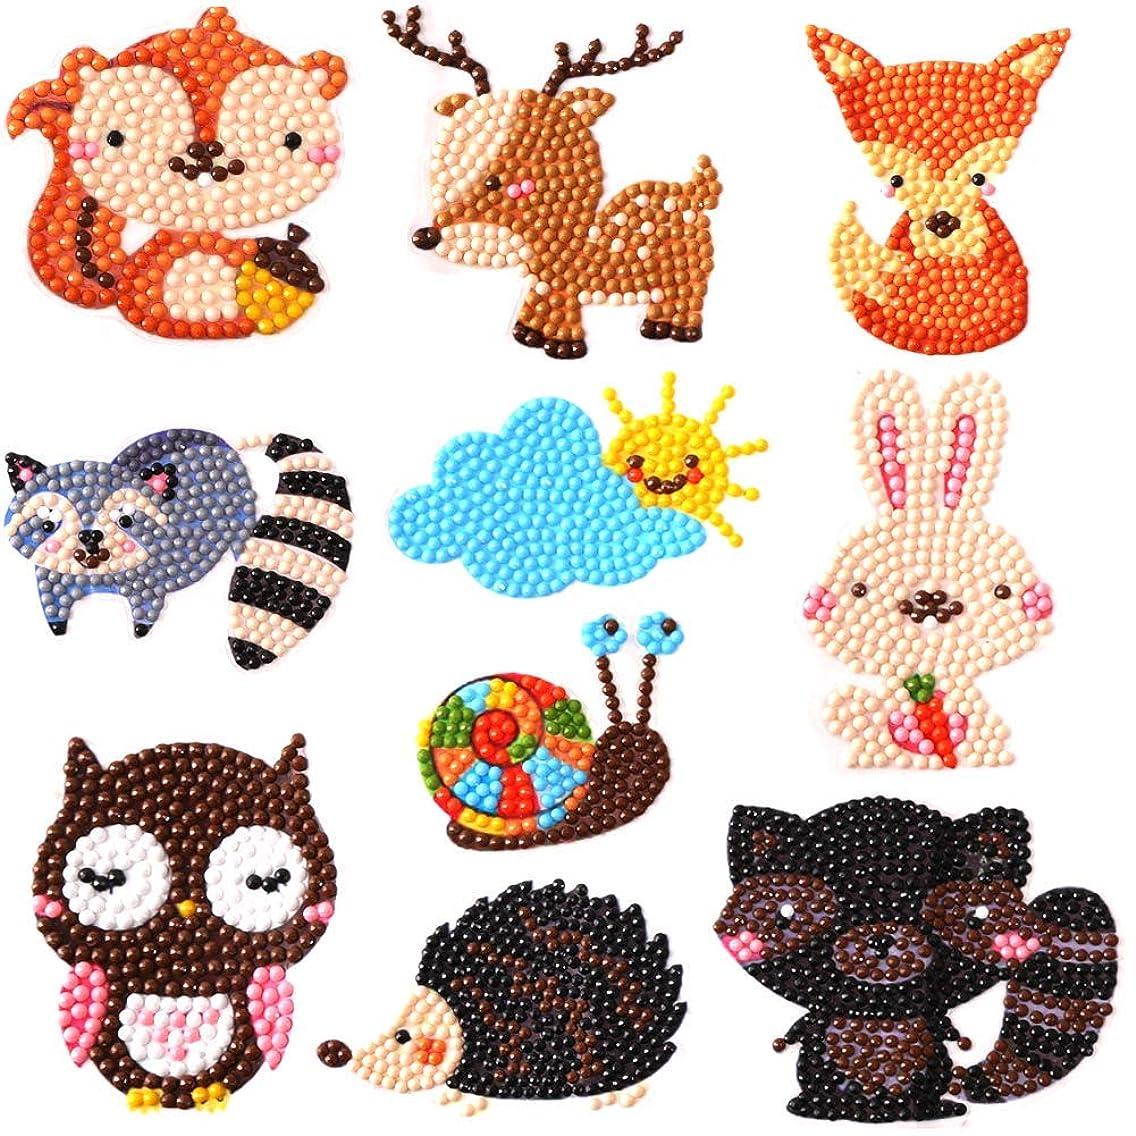 Mini 5D Diamond Painting Stickers Animals Fruits Cactus DIY Resin Cross Stitch Kit Home Decor Craft (Animals)